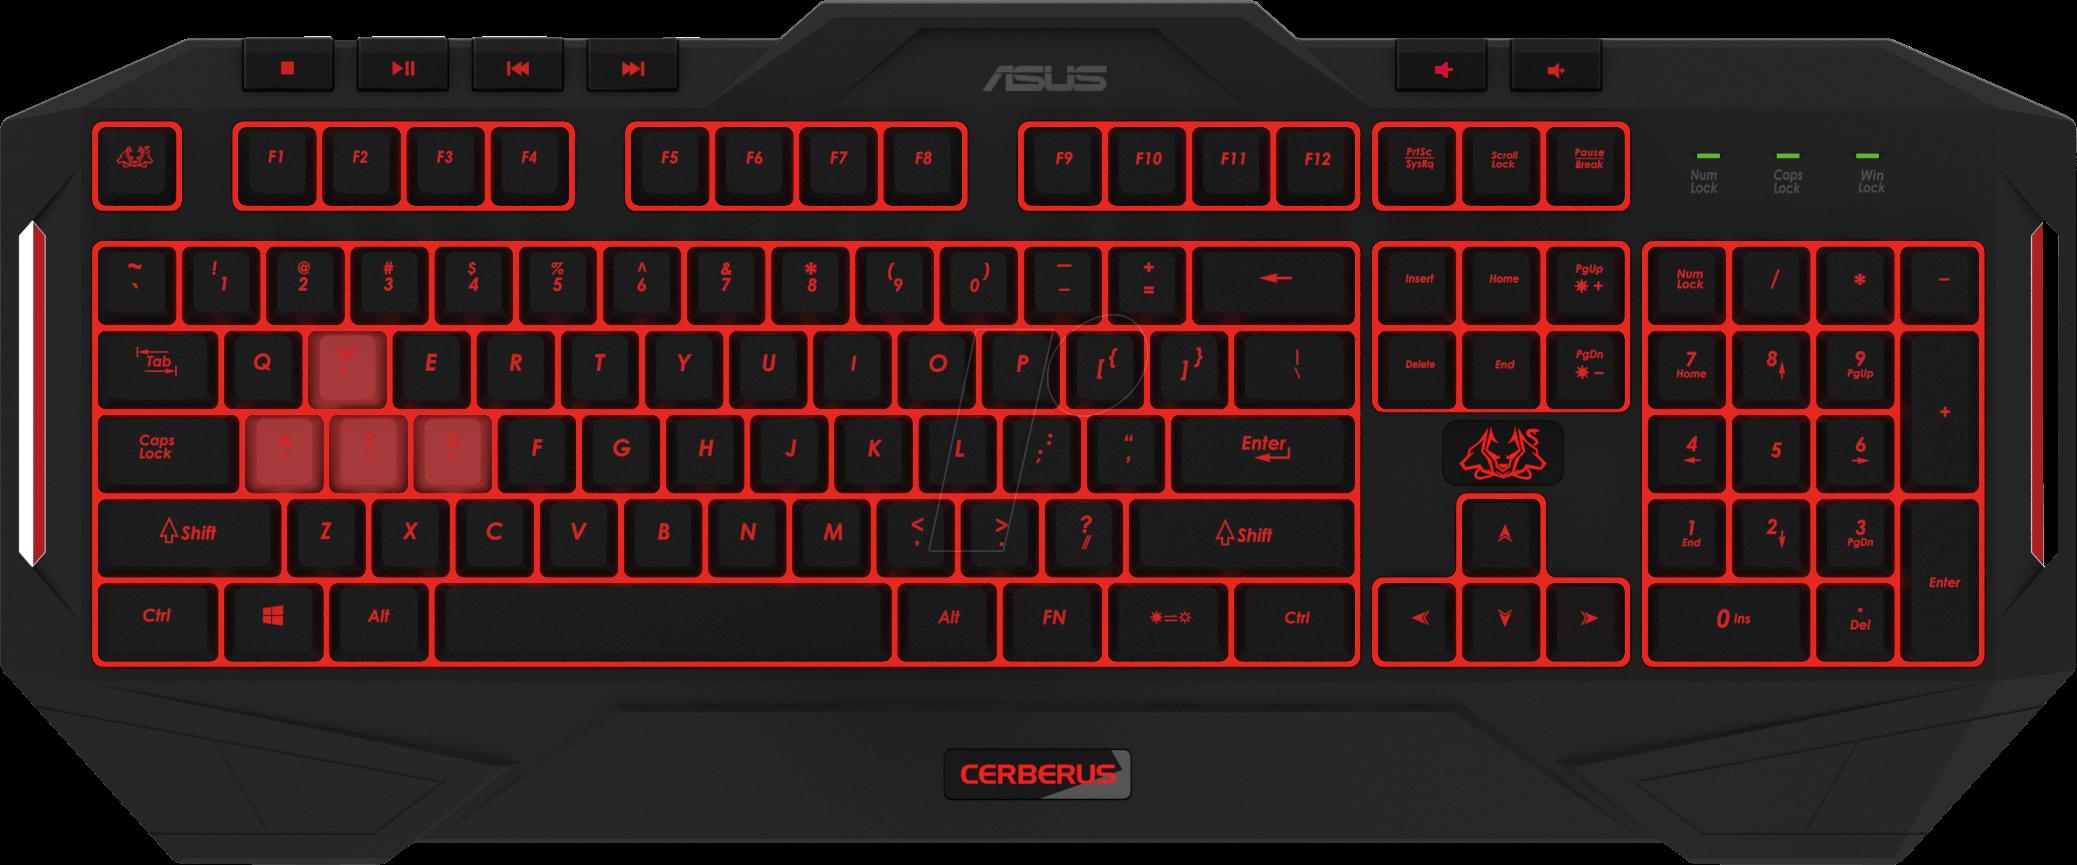 toetsenbord usb zwart gaming verlicht asus 90yh0131 b2ga00